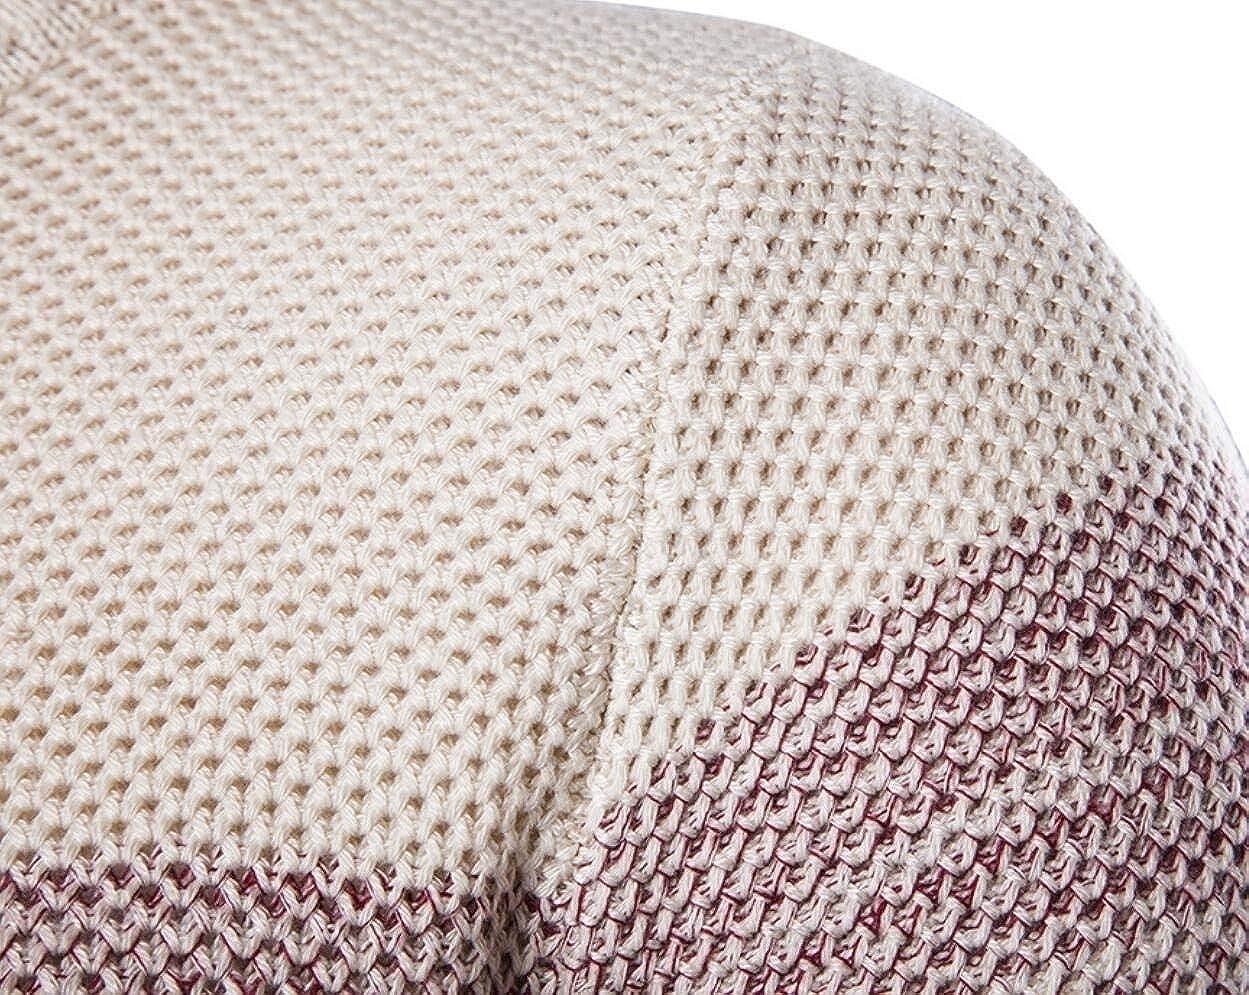 Mfasica Mens Long Sleeve Striped Printed Crewneck Knit Color Block Jumper